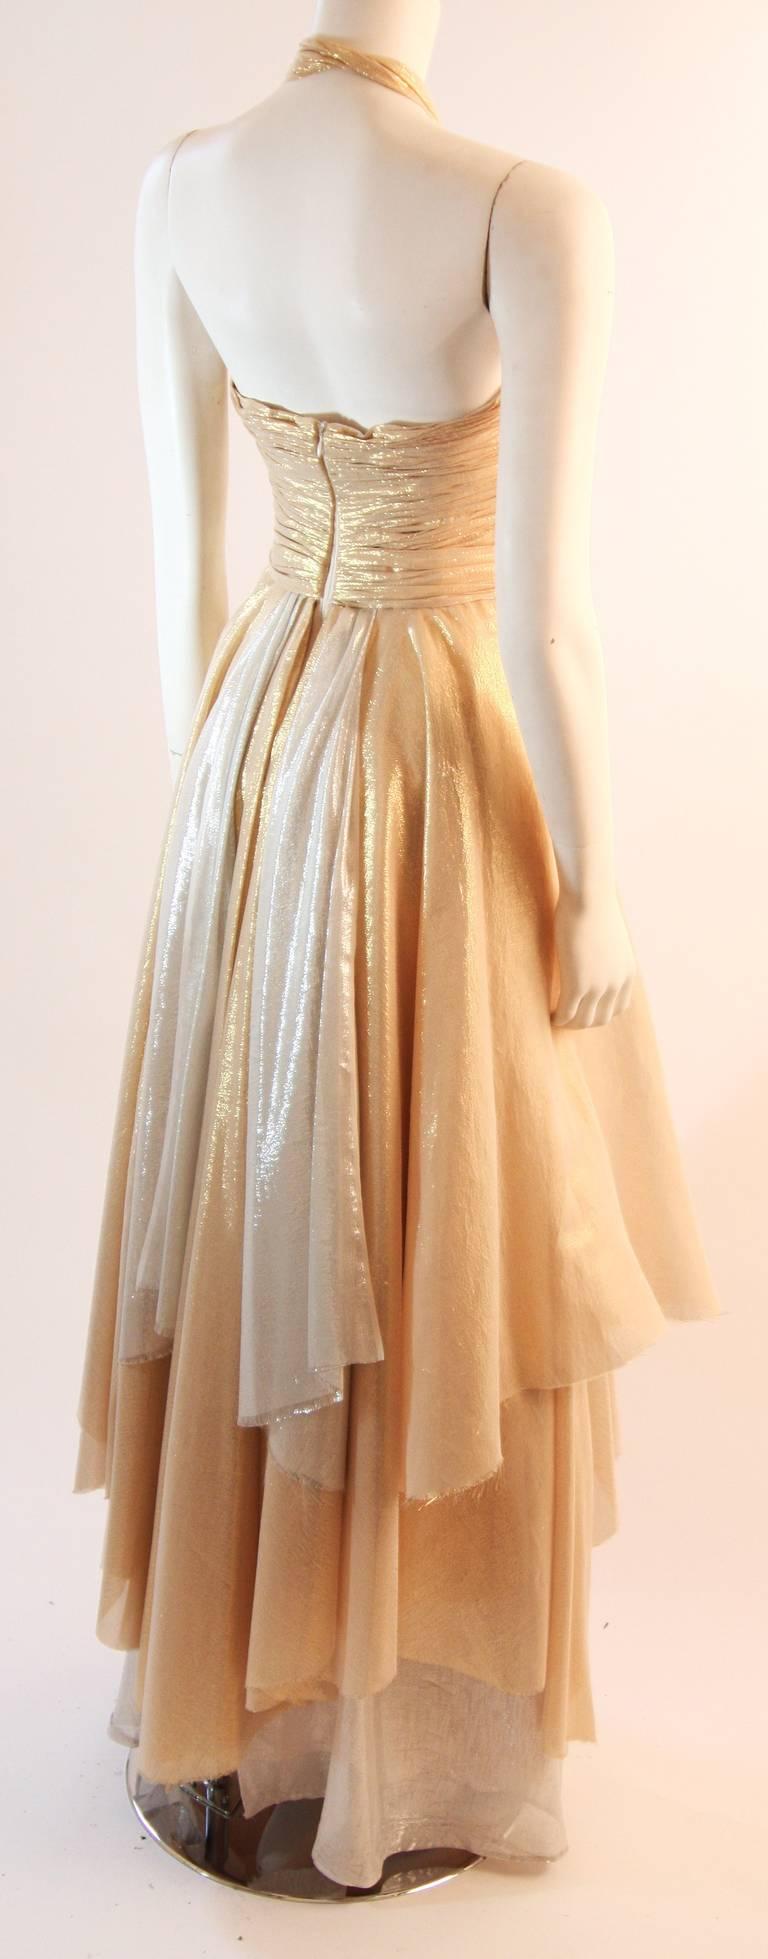 Elizabeth Mason Gold Lame Custom Couture Gown 6